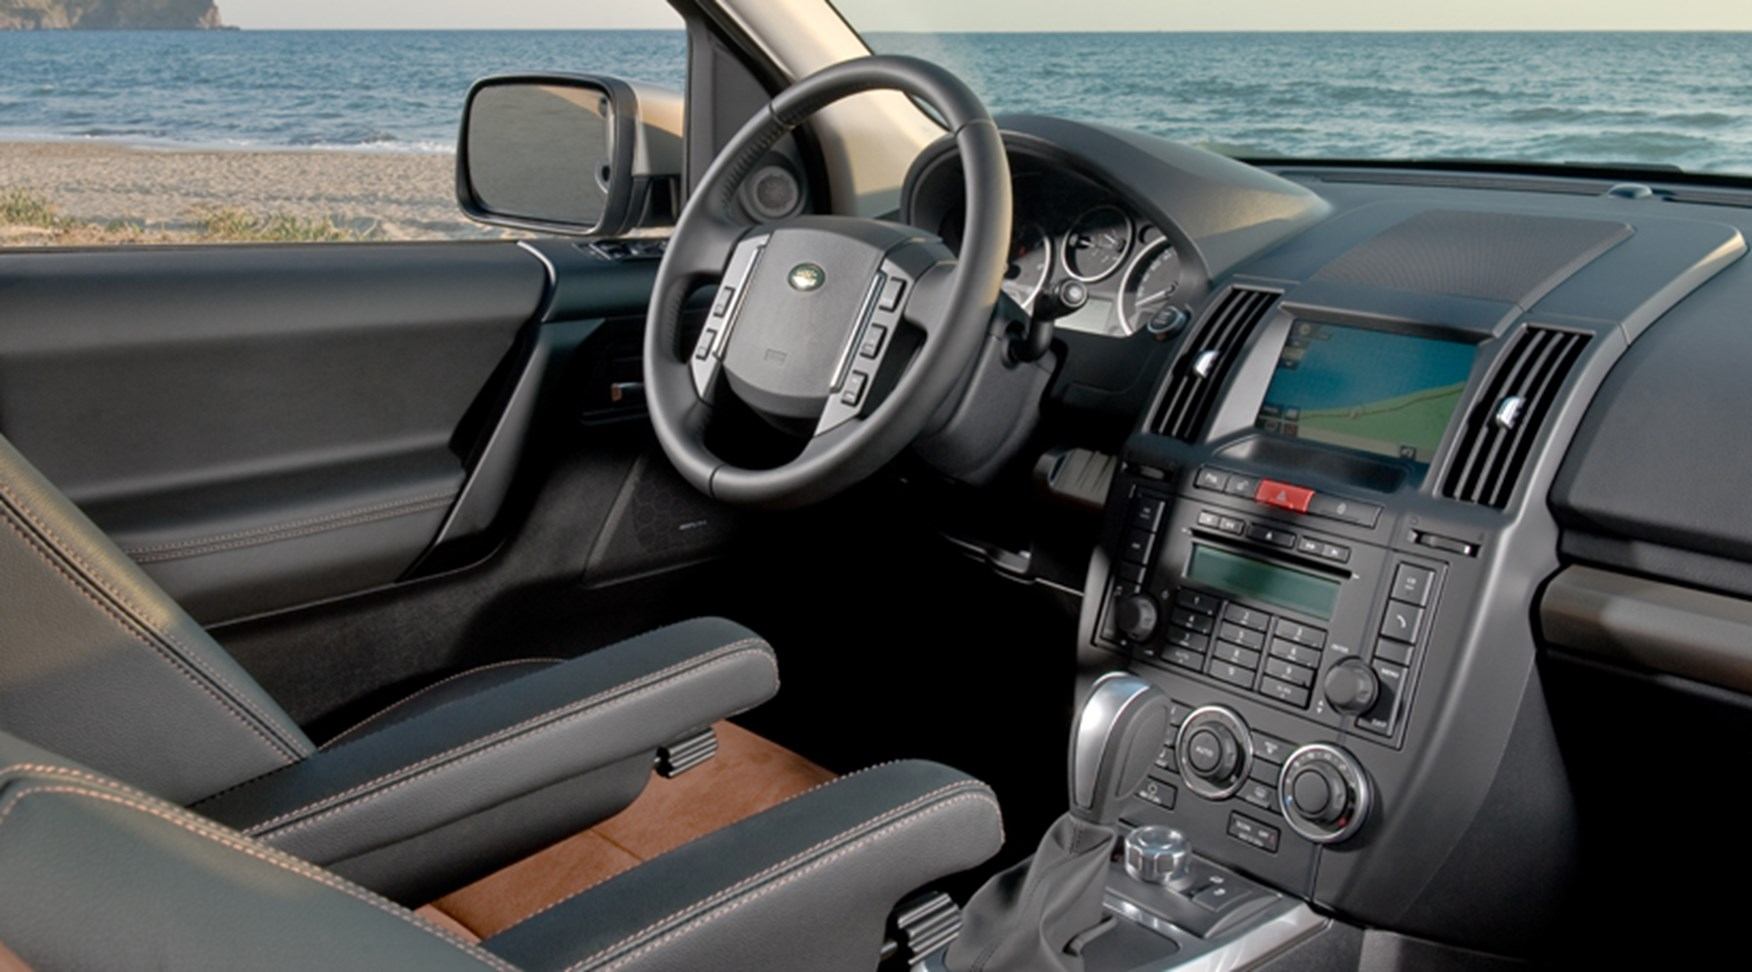 Land Rover Freelander 2 The Official 2011 Facelift Car